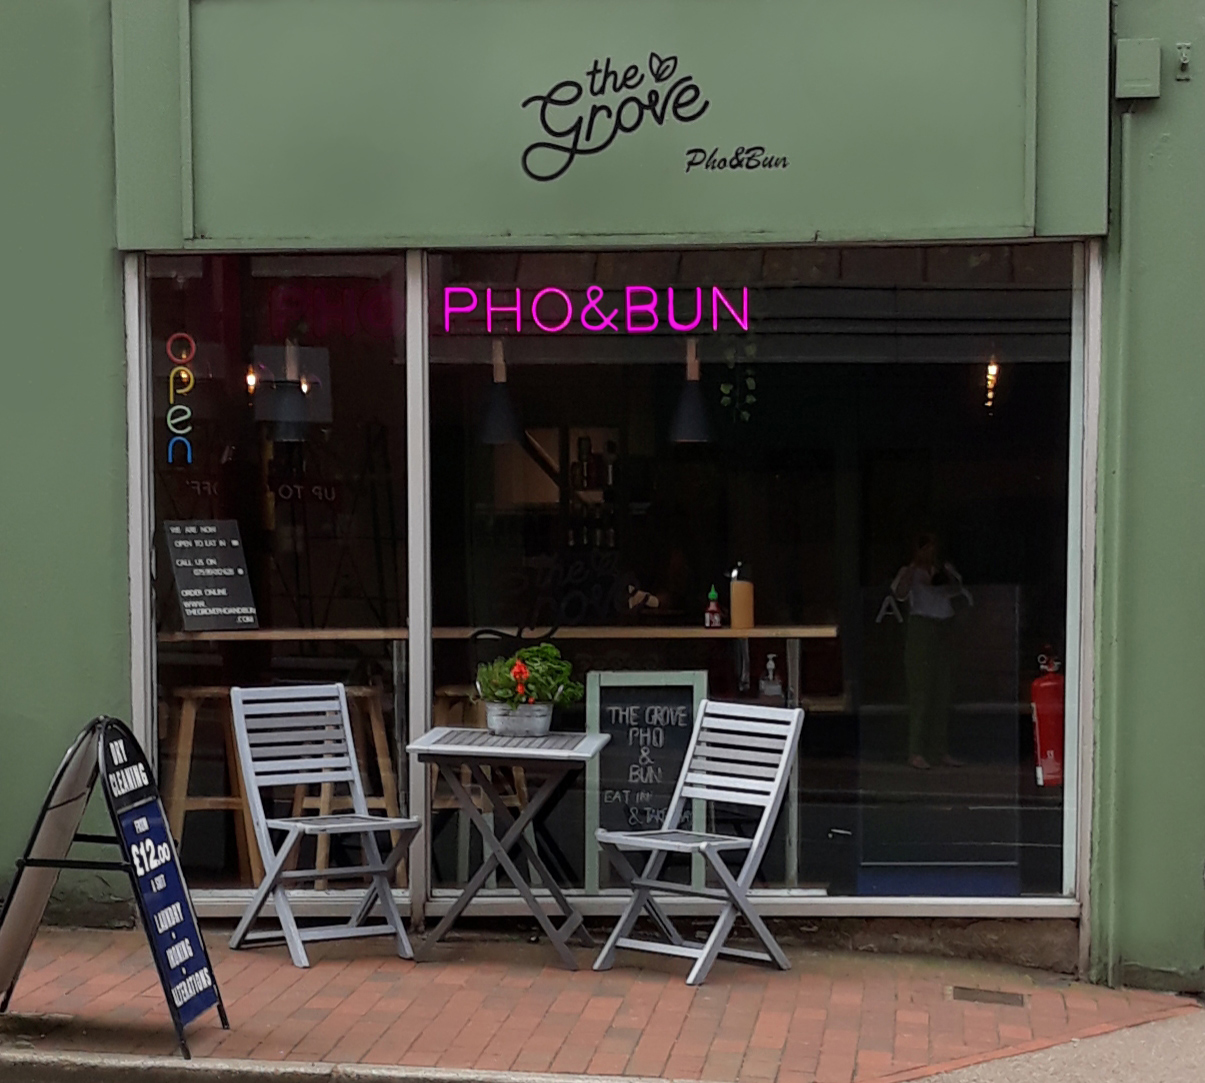 Pho and Bun cafe restaurant store front, Royal Tunbridge Wells